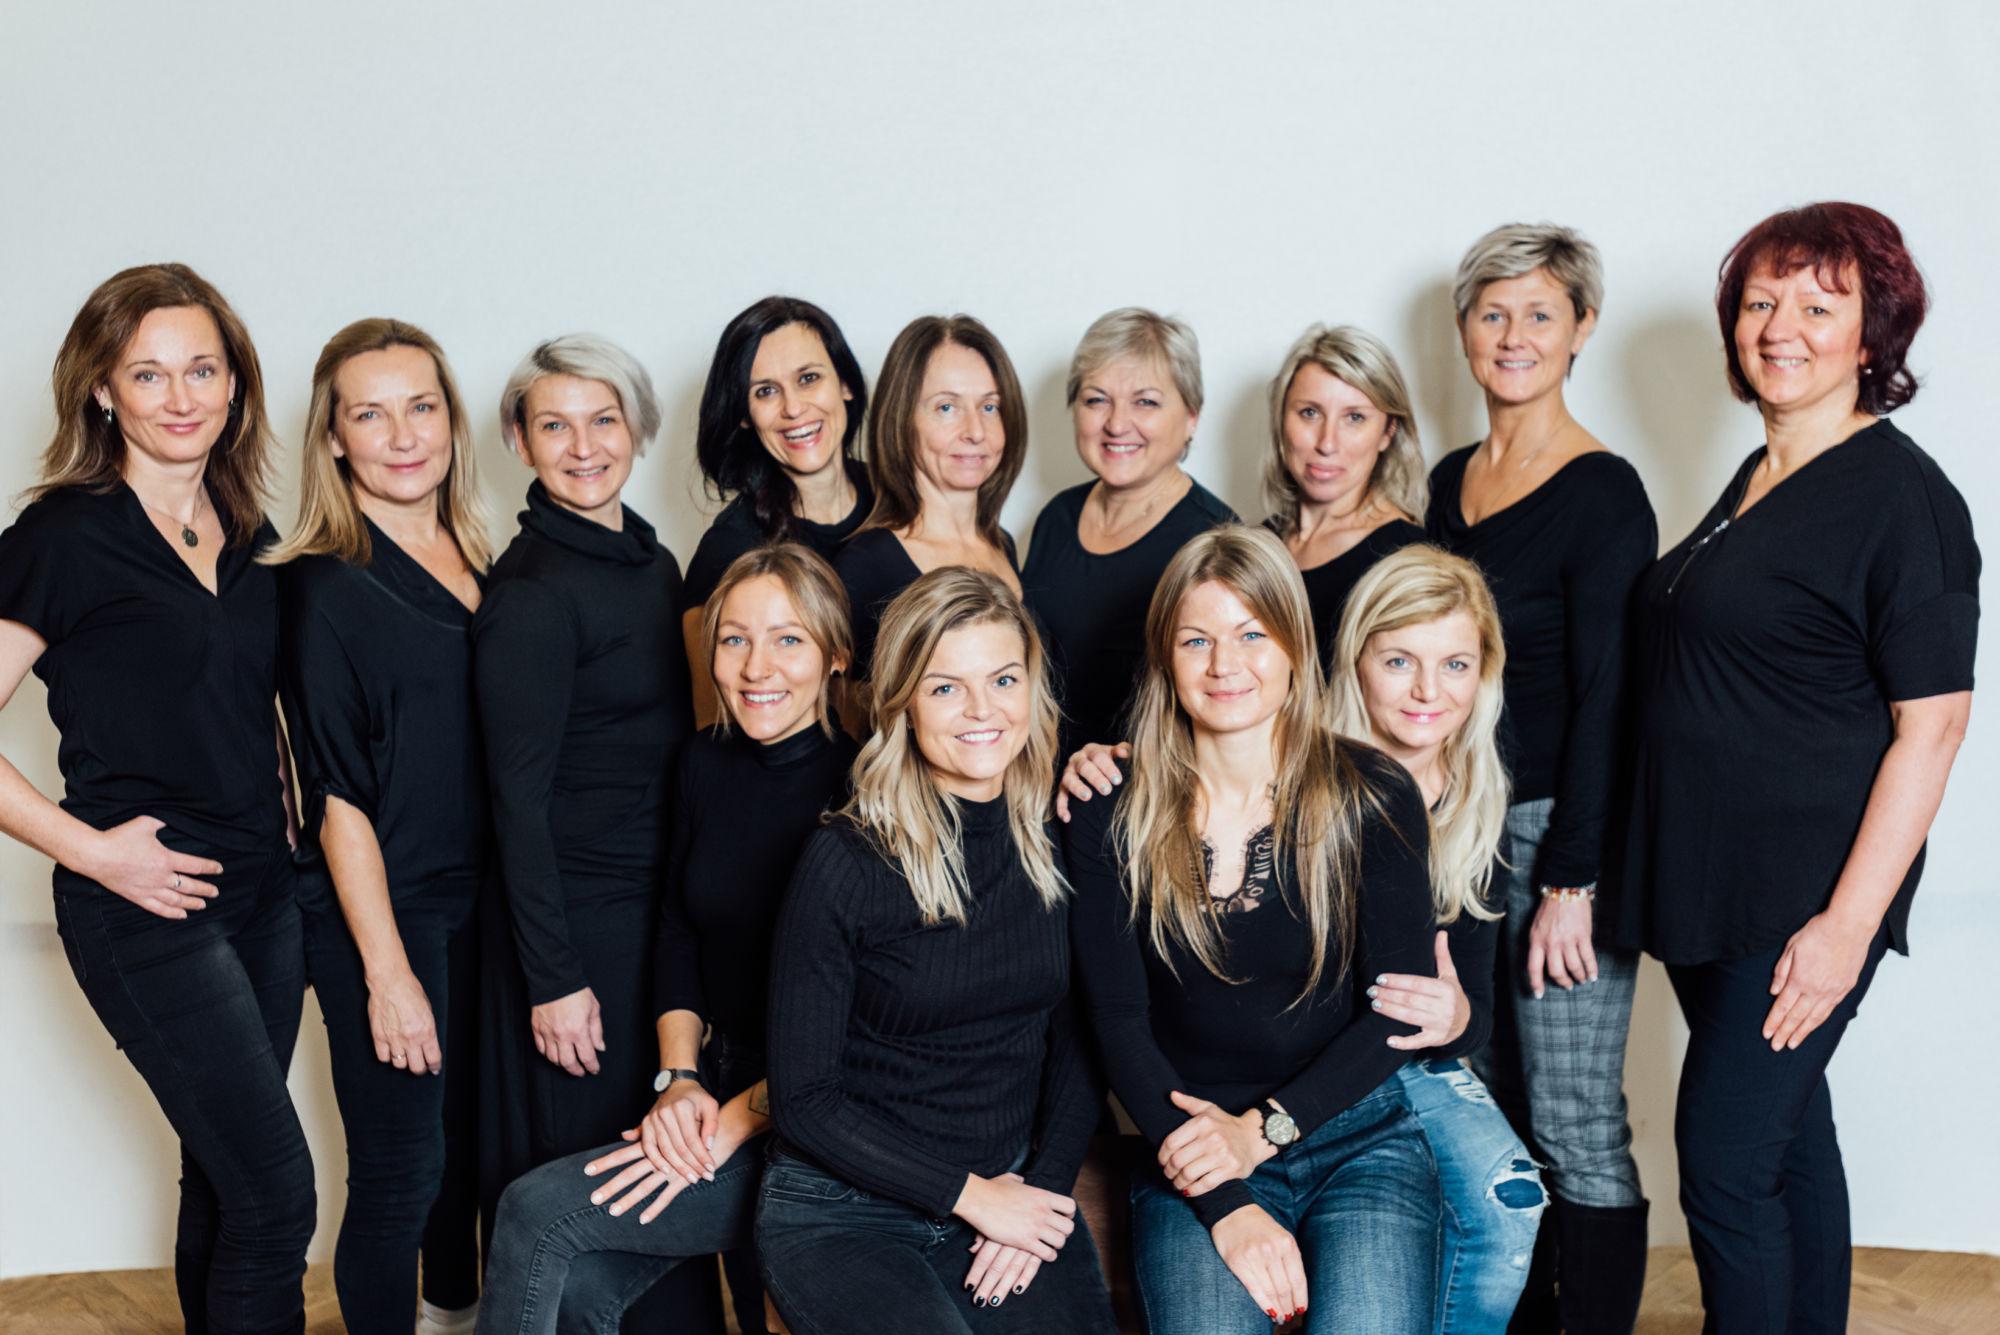 hana-toufarova-mother-daughter-business-family-firma-instruktor-fitpainfree-hanatoufarova-czech-terapeut-posturalni-cviceni-bezbolesti-cviky-fpf-academy-lektor-painfree